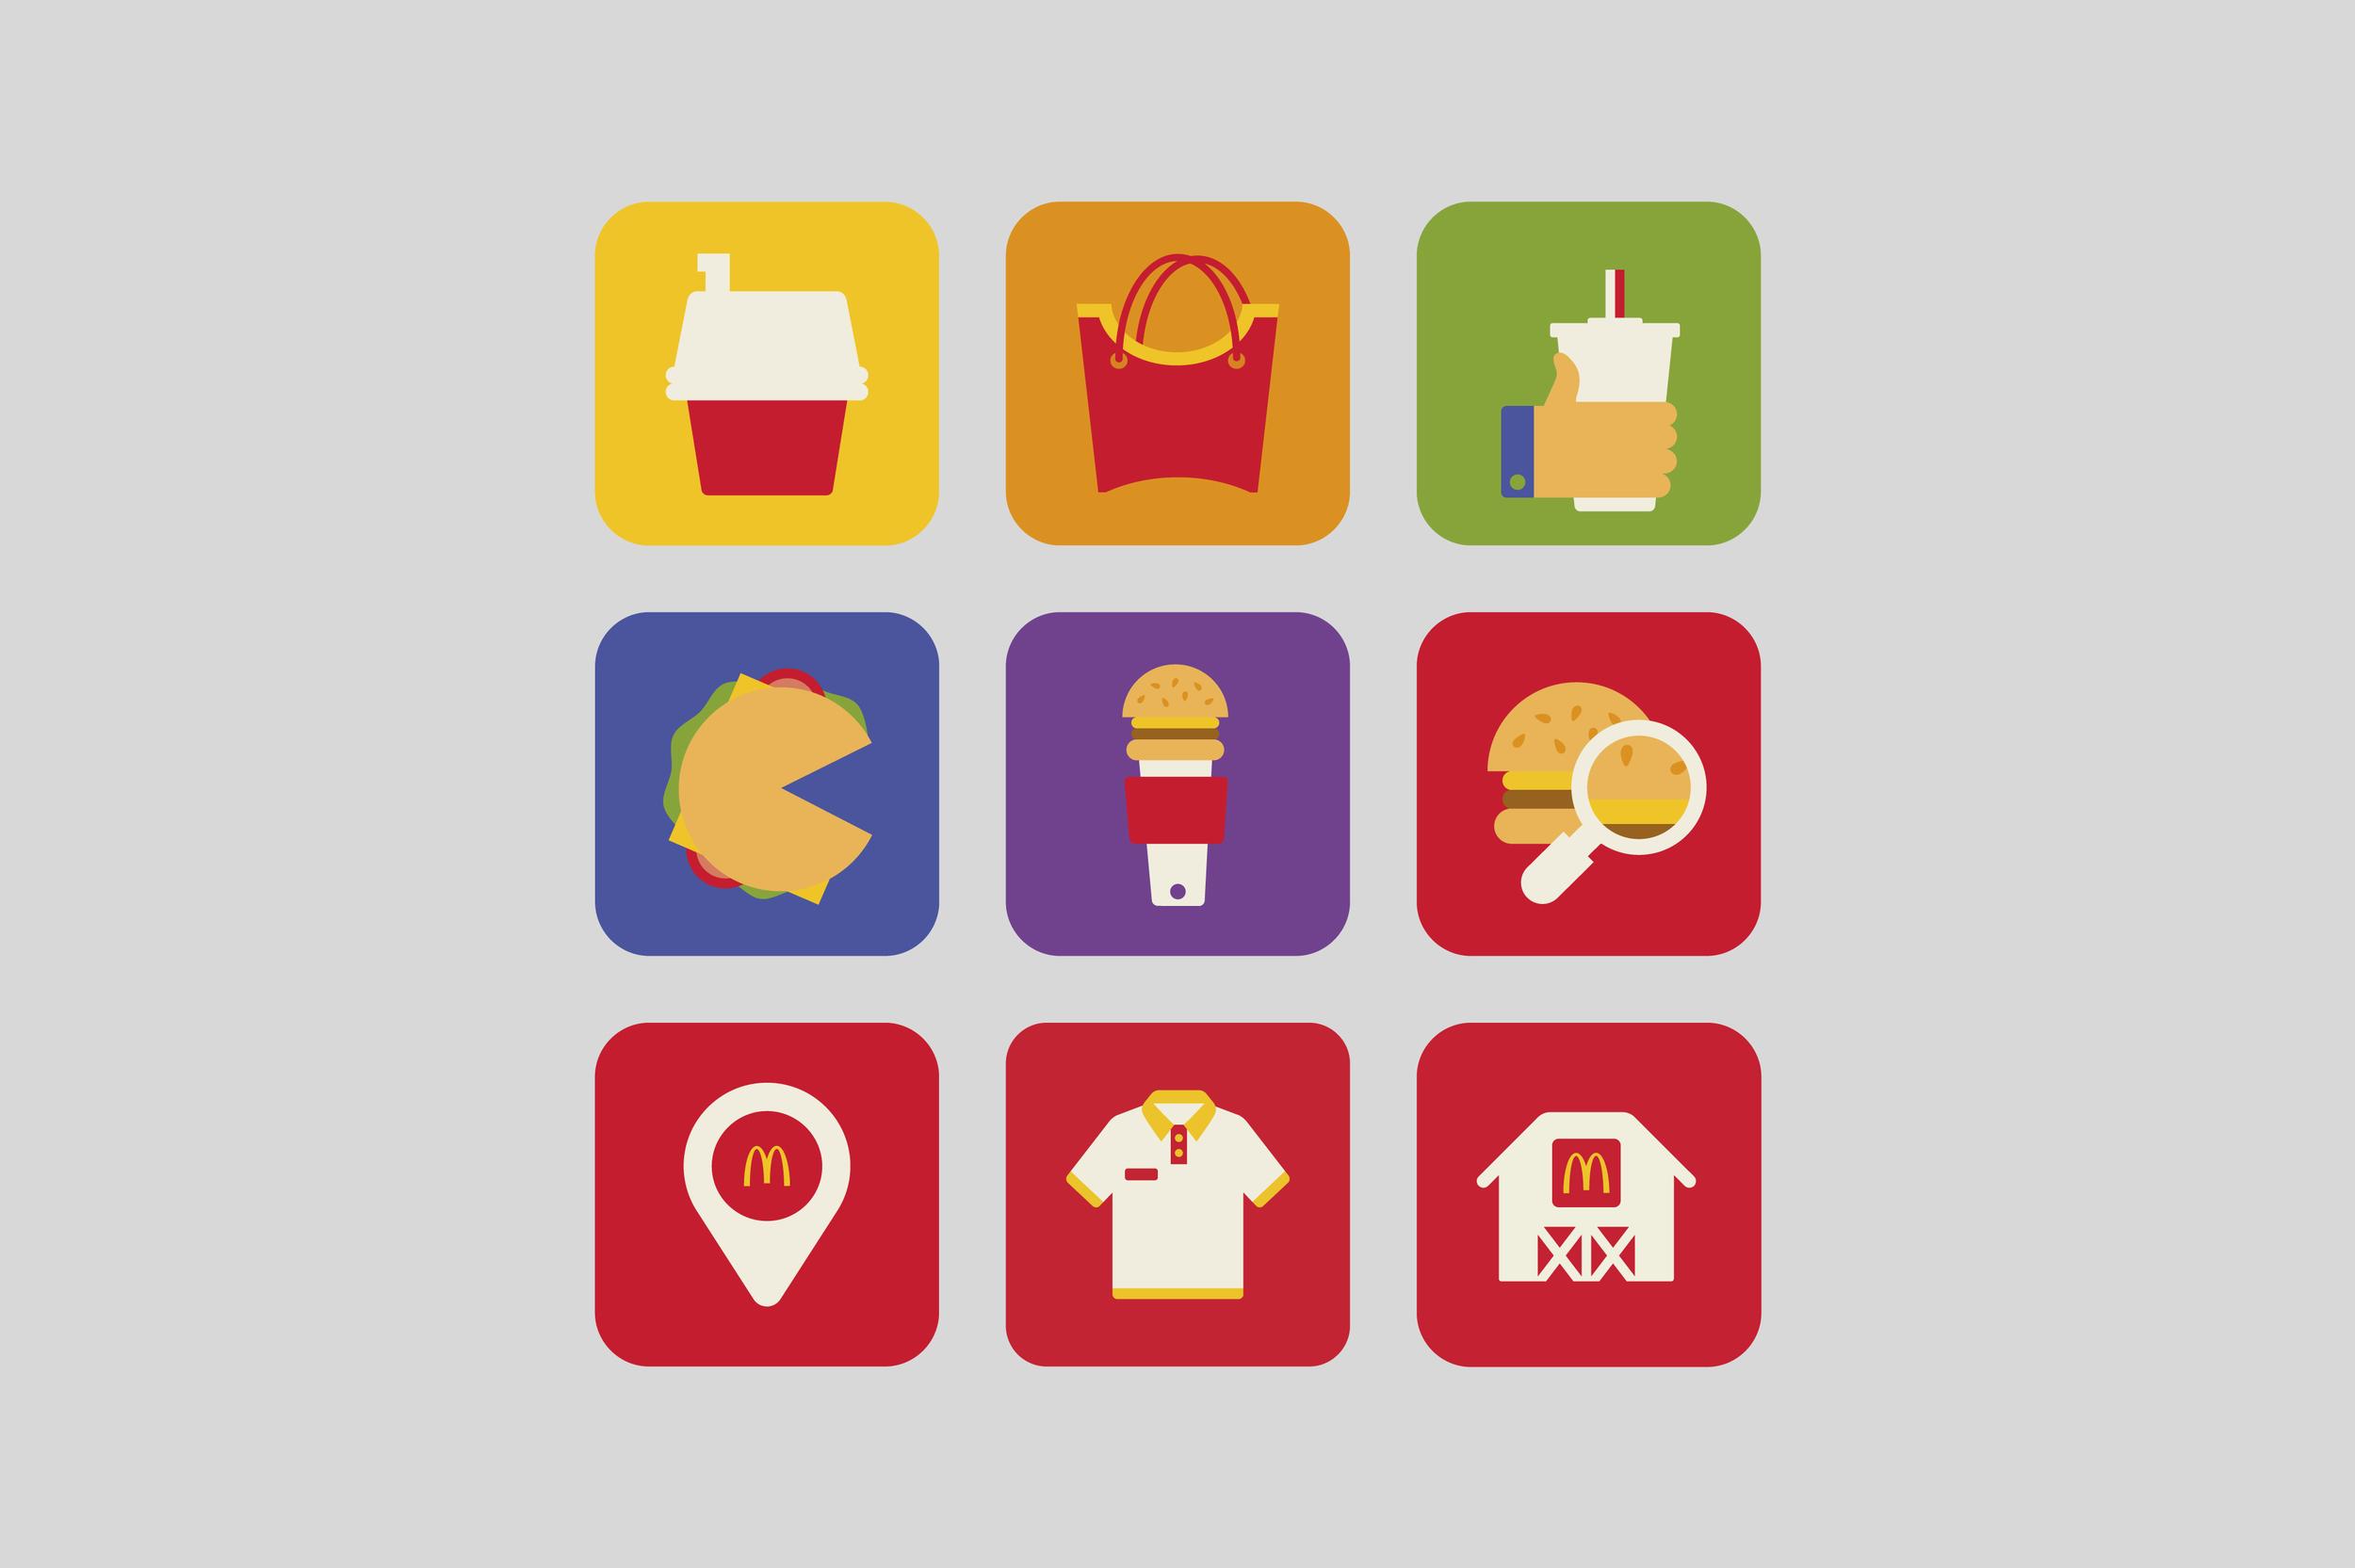 McDonald's Restaurant of the Future Icons